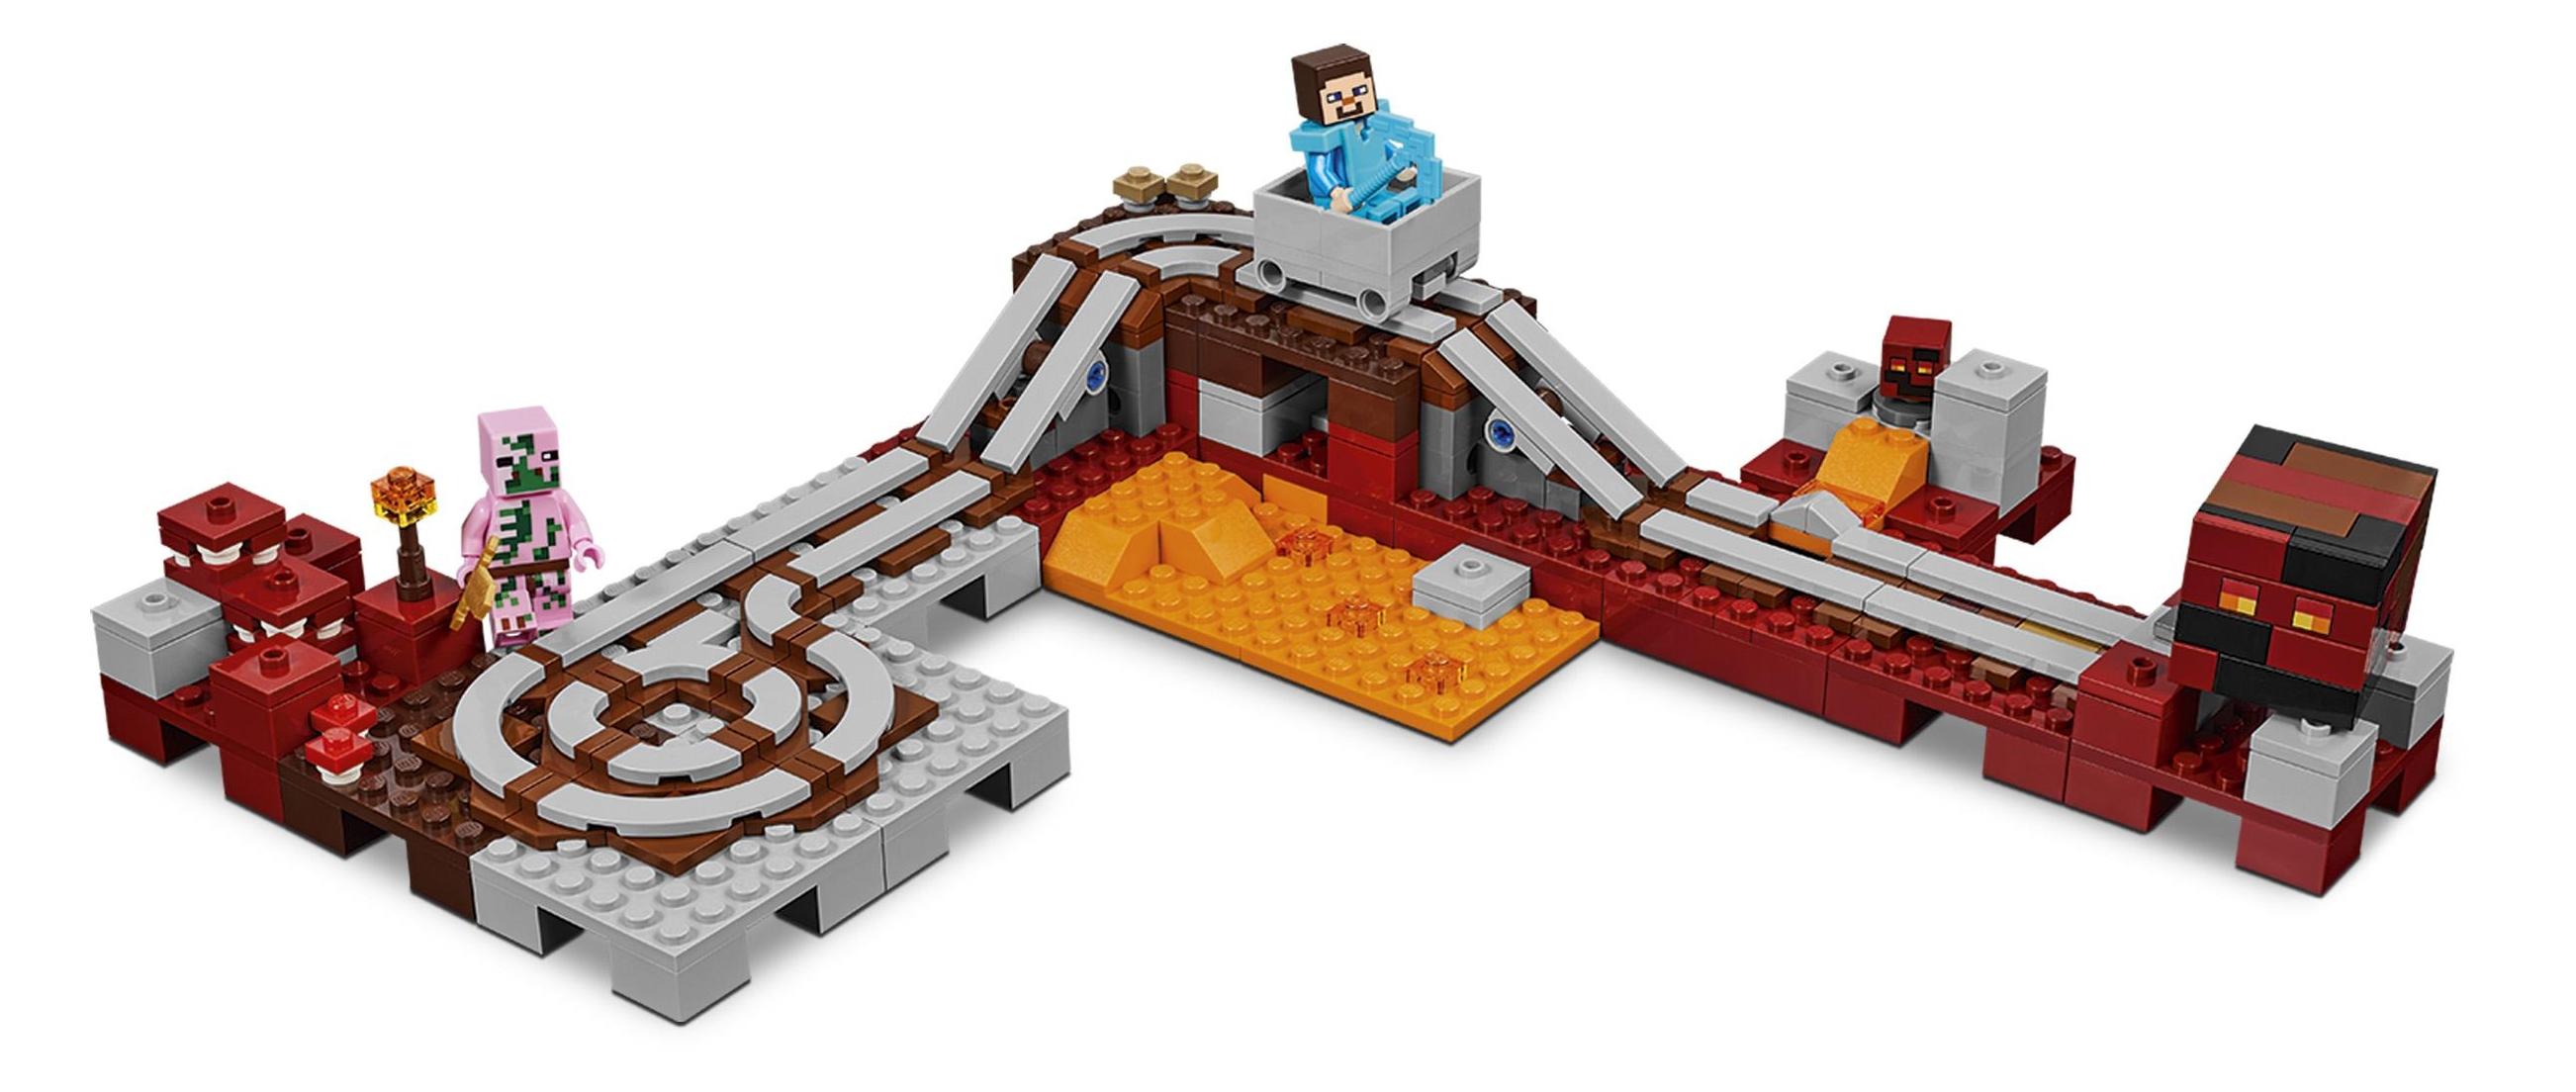 Tren del infierno de Lego Minecraft 21130